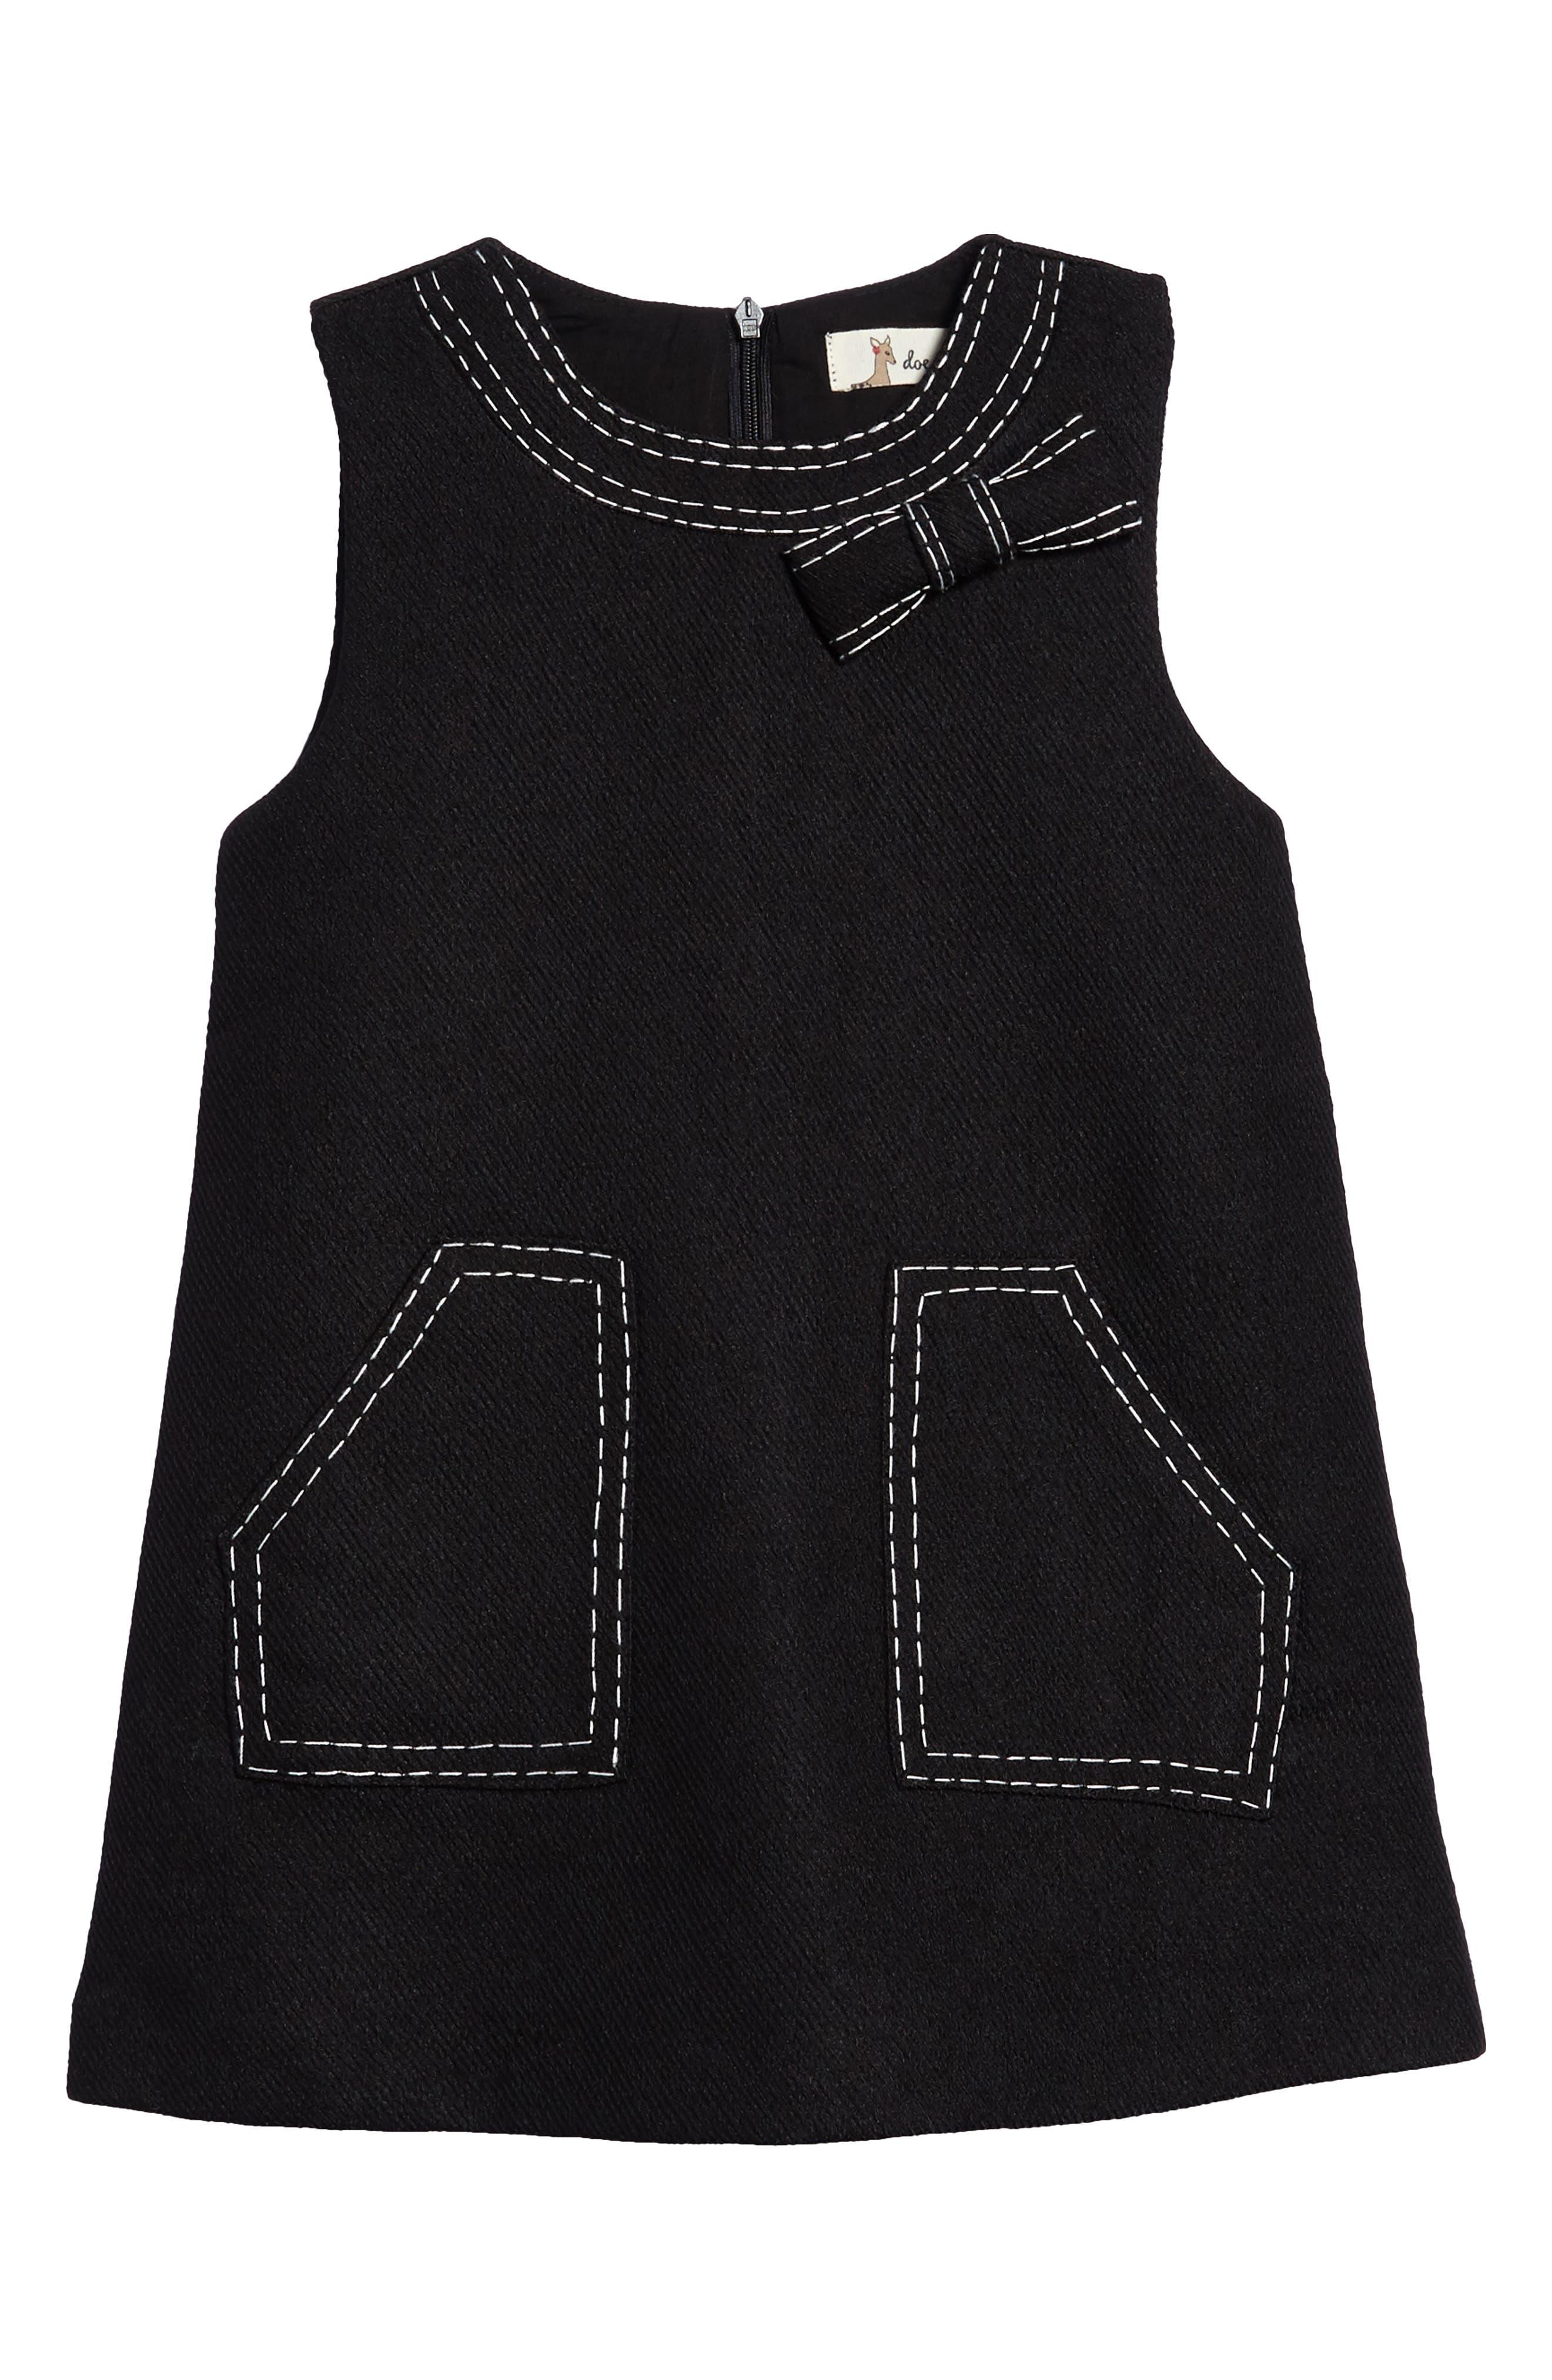 Mod Sleeveless Shift Dress,                             Main thumbnail 1, color,                             001